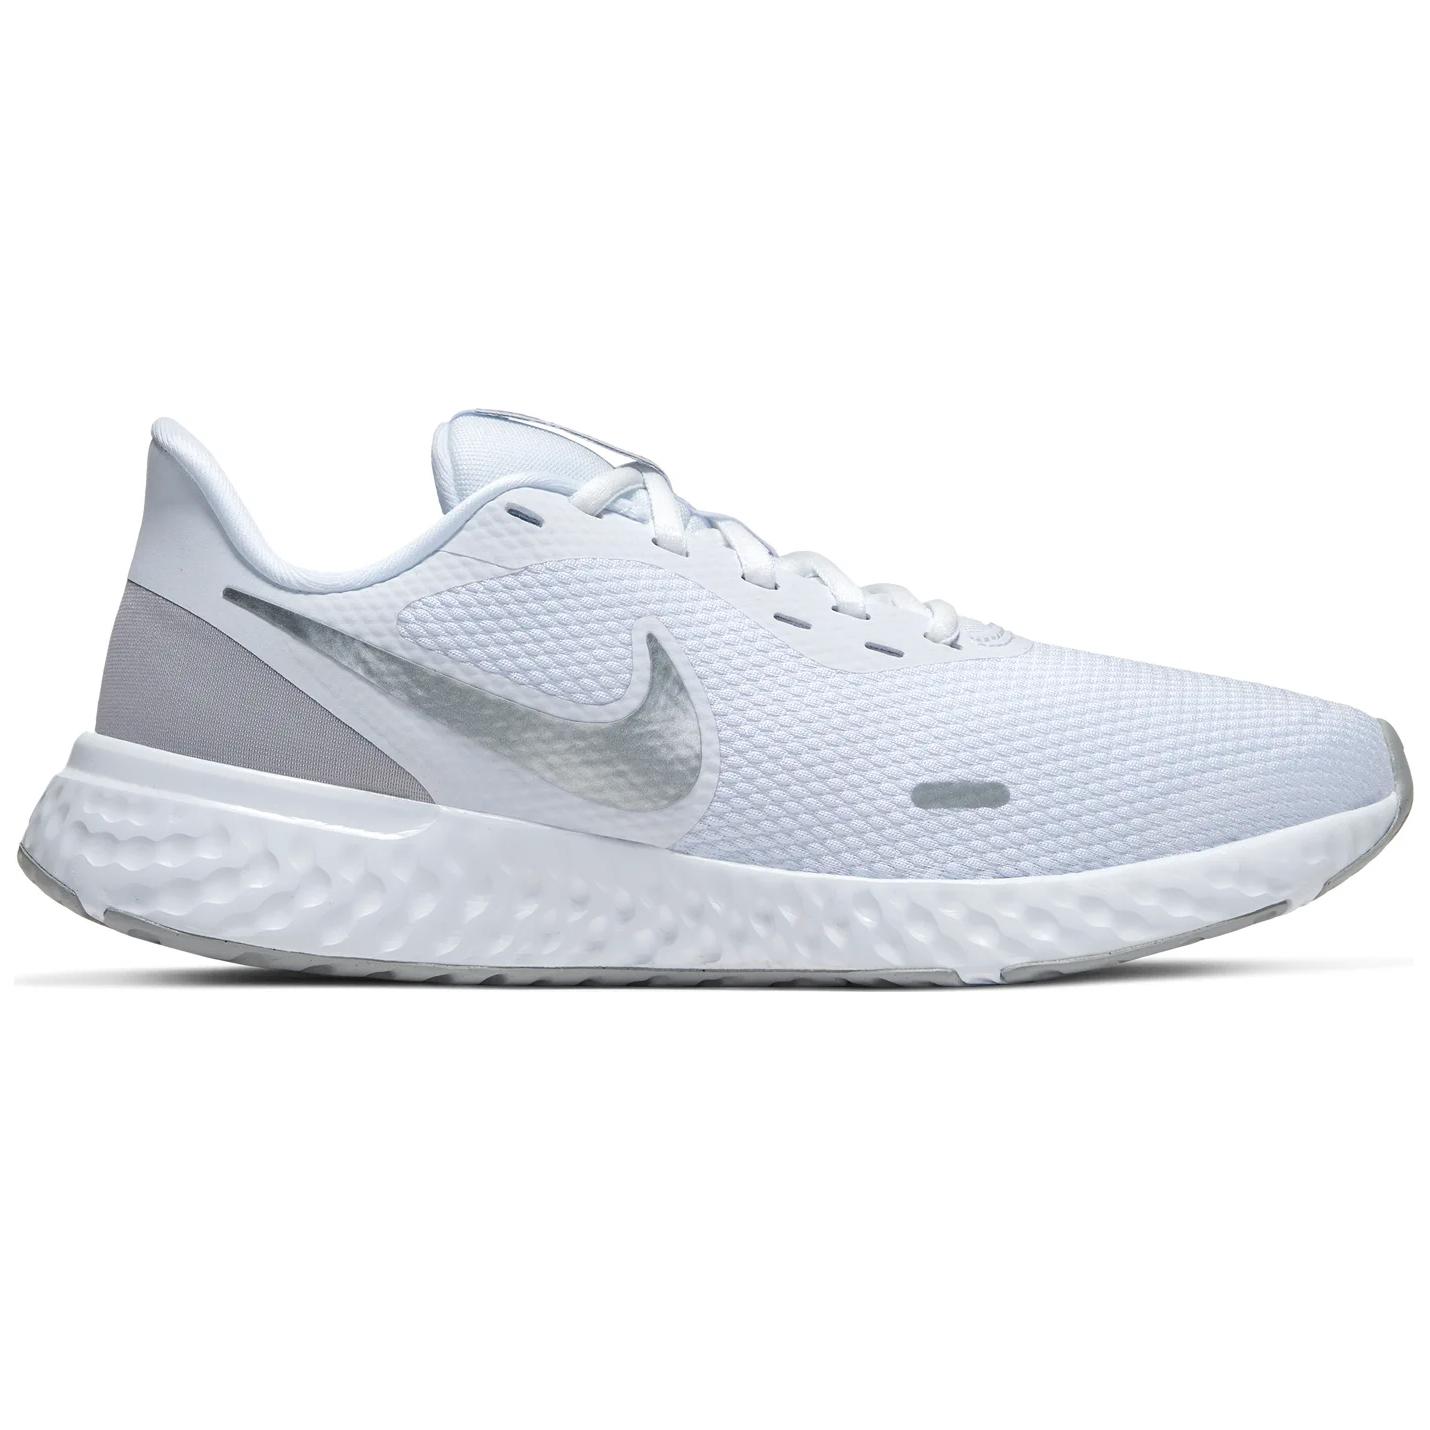 Nike WMNS Revolution 5 Damen Running weiß grau BQ3207 100